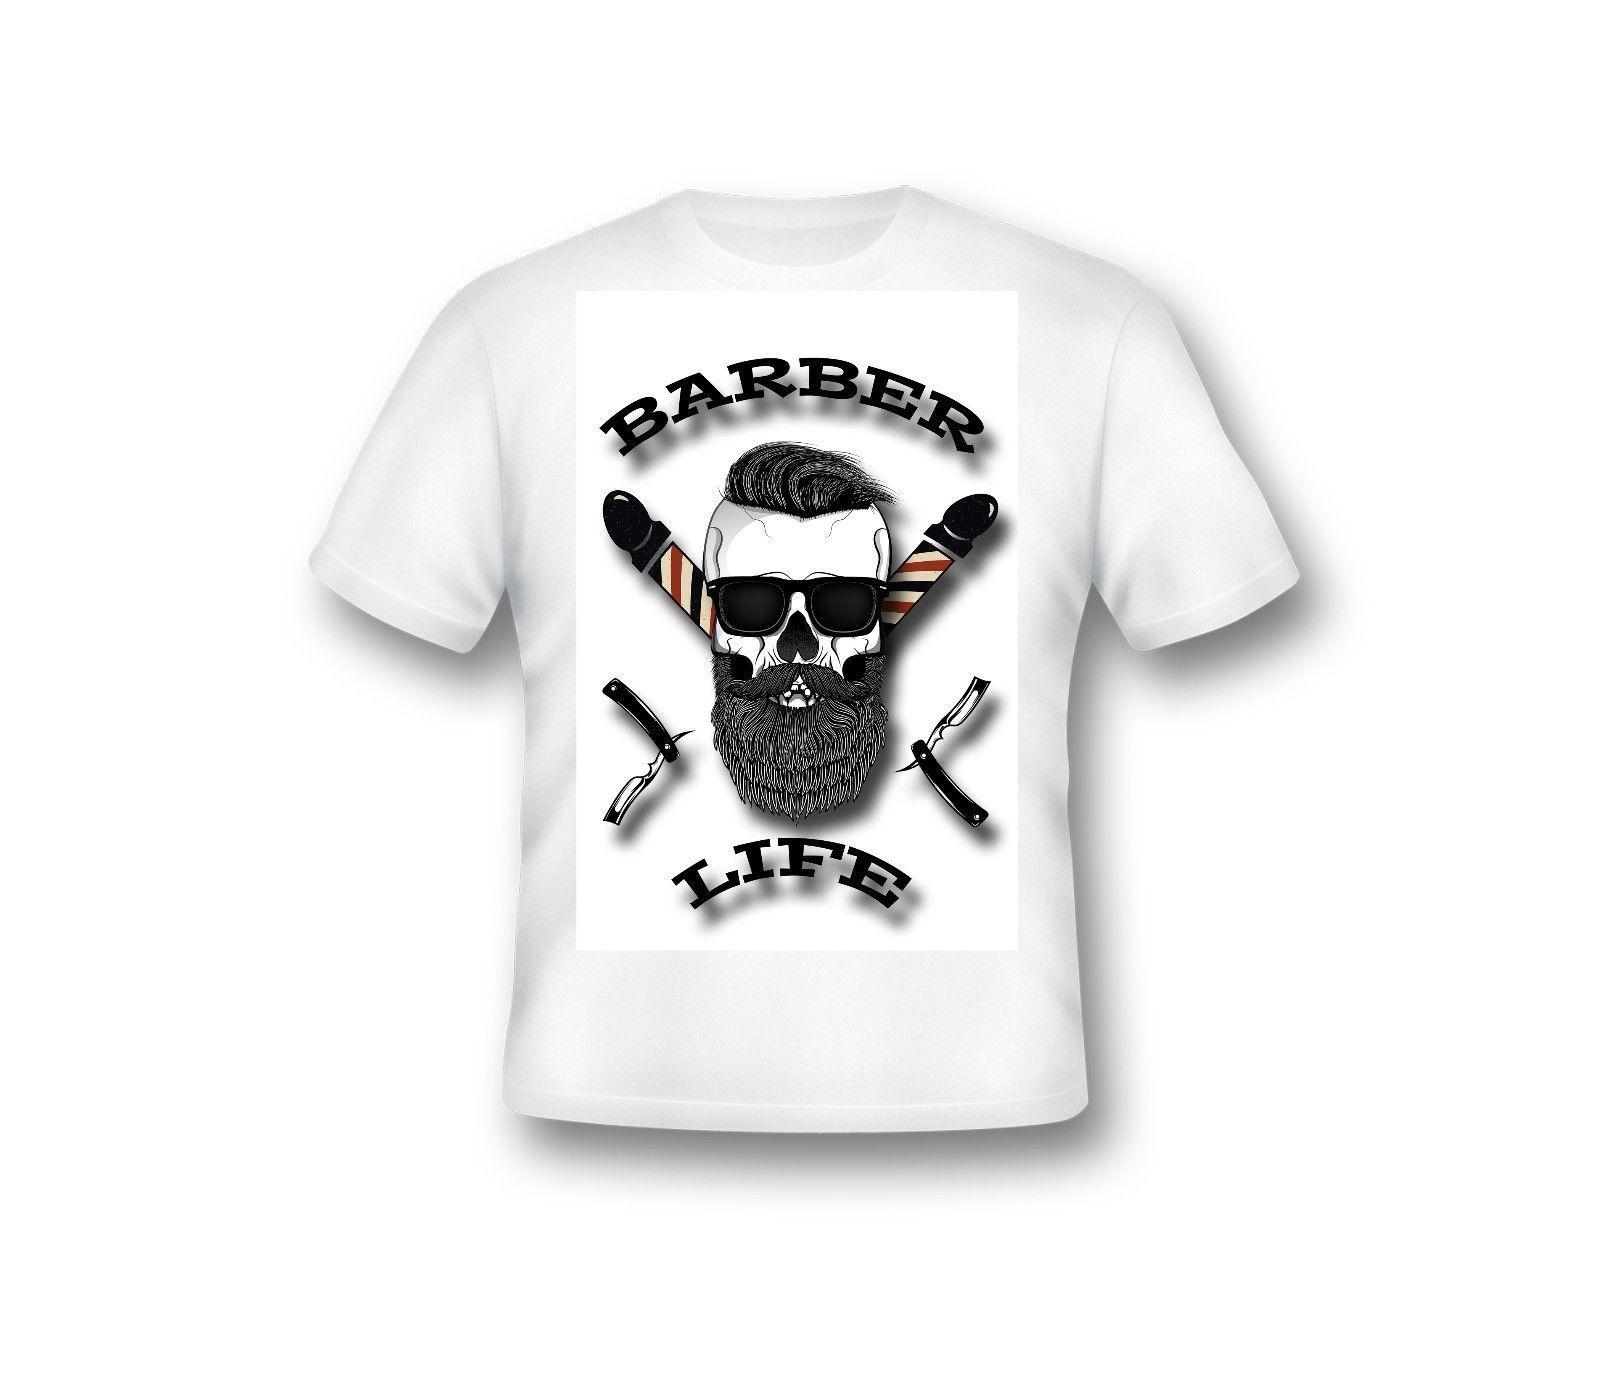 new styles 7959d 0949e Salon de coiffure T shirt,moderne Barber Life chemise, homme, vêtement, 73  Funny Men Classic Casual Tee Shirts 100% cotton short sleeves